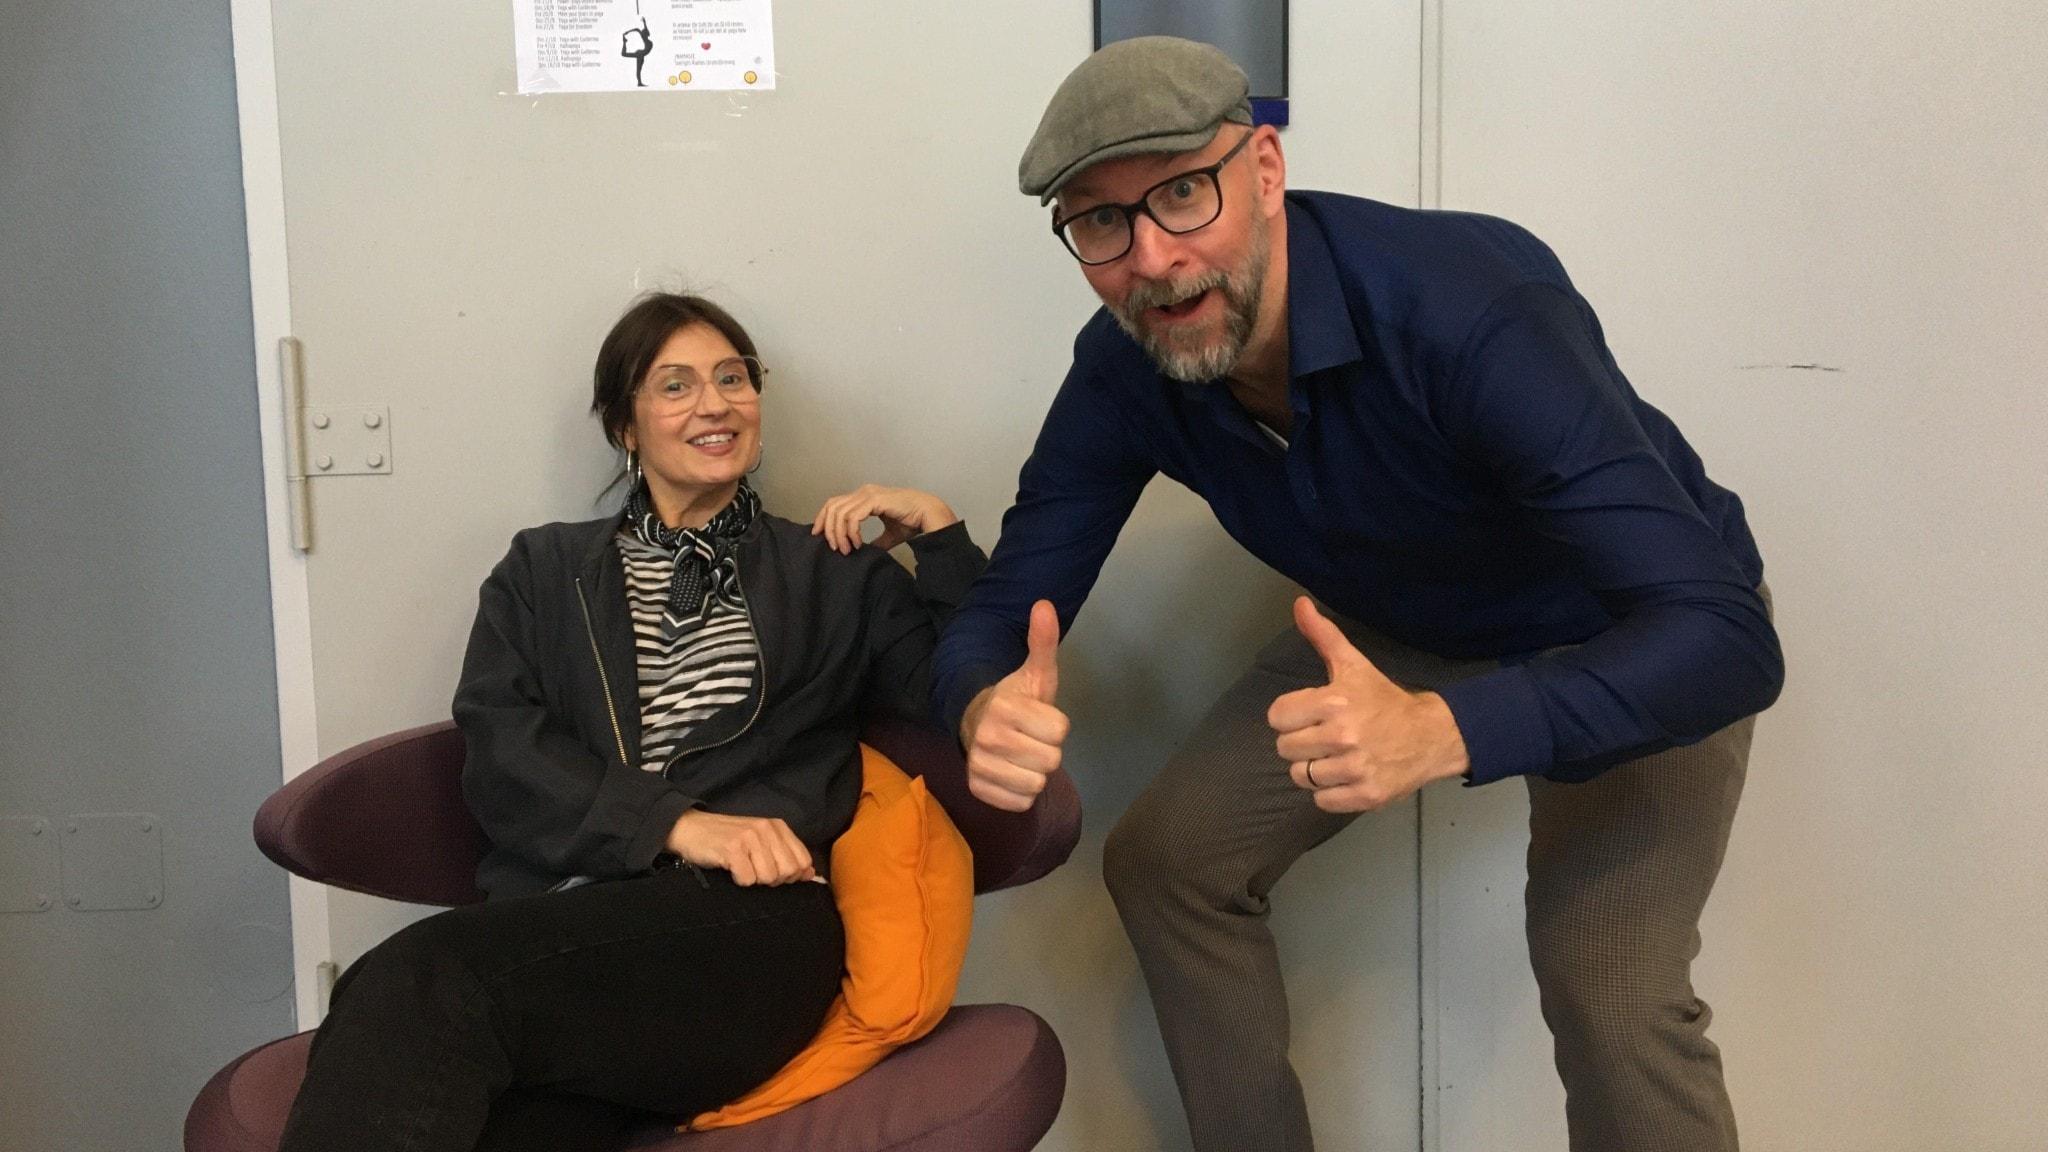 Fredag i P4 leds av Susanna Dzamic och Kalle Lind.